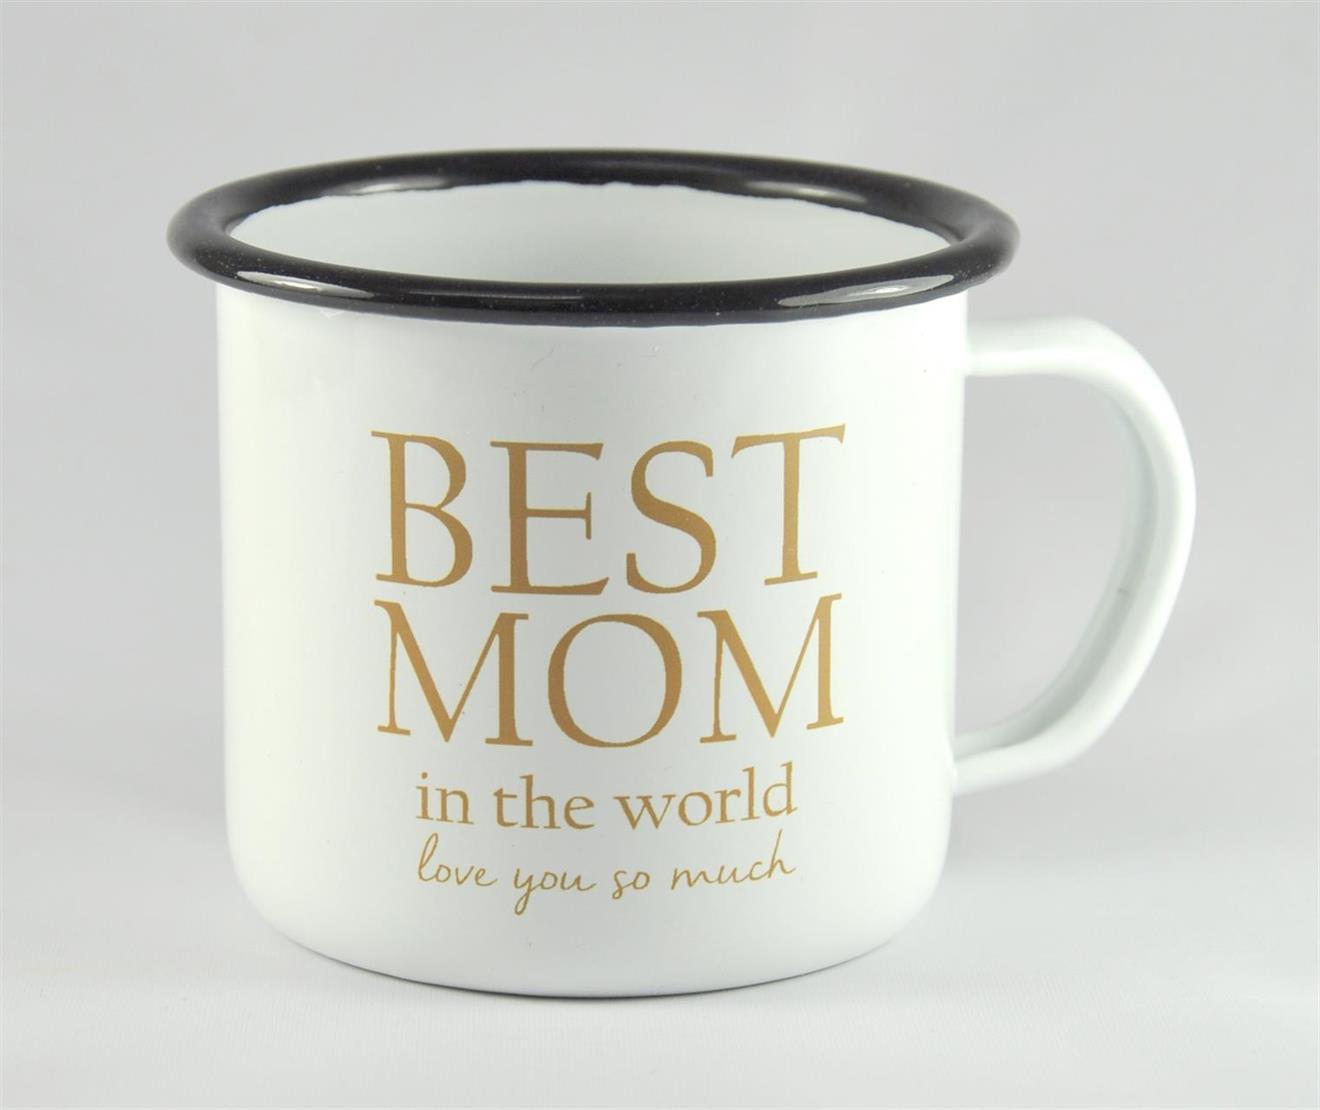 Emaljmugg, Best Mom, vit/guldtext